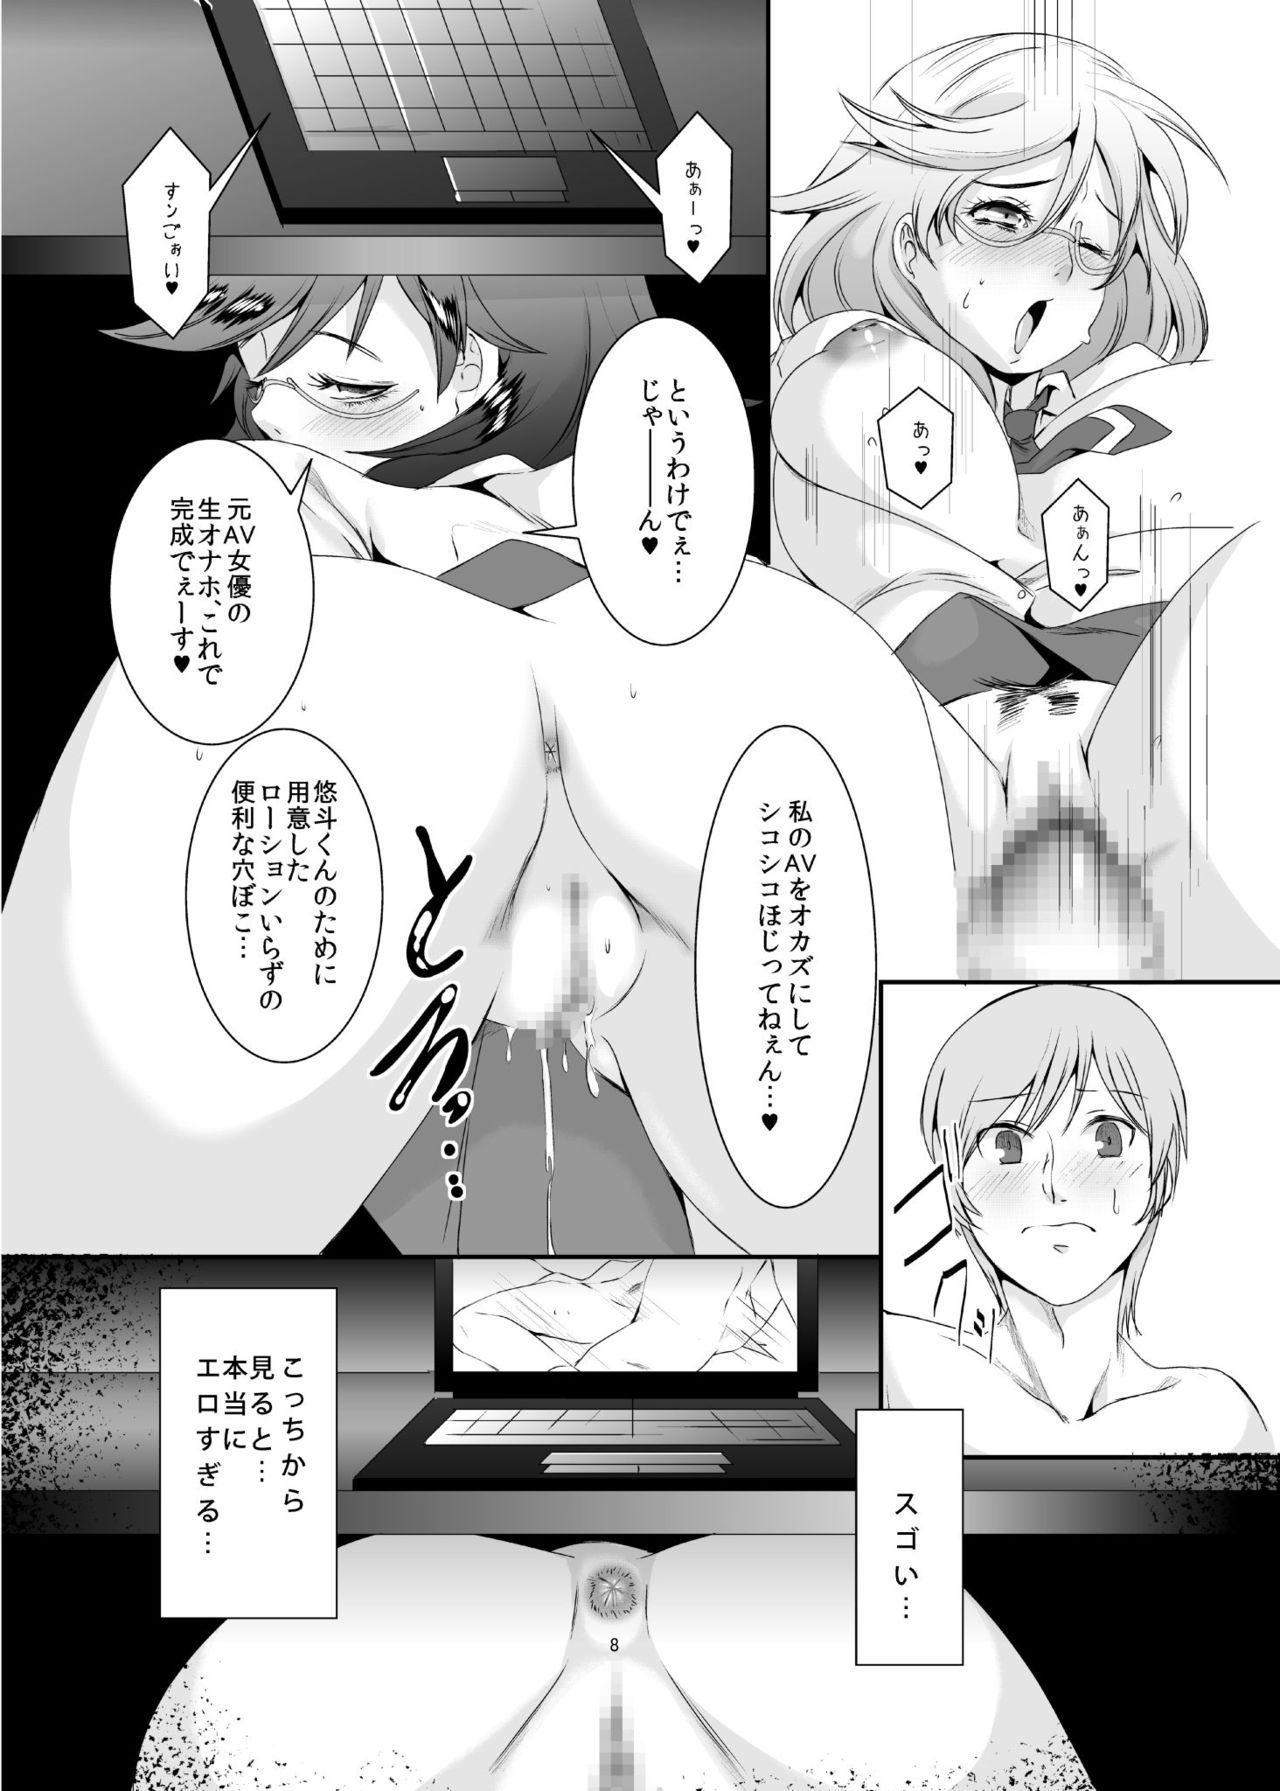 [Sprechchor (Eguchi Chibi)] Oku-sama wa Moto Yariman -Besluted- 5 [Digital] 8